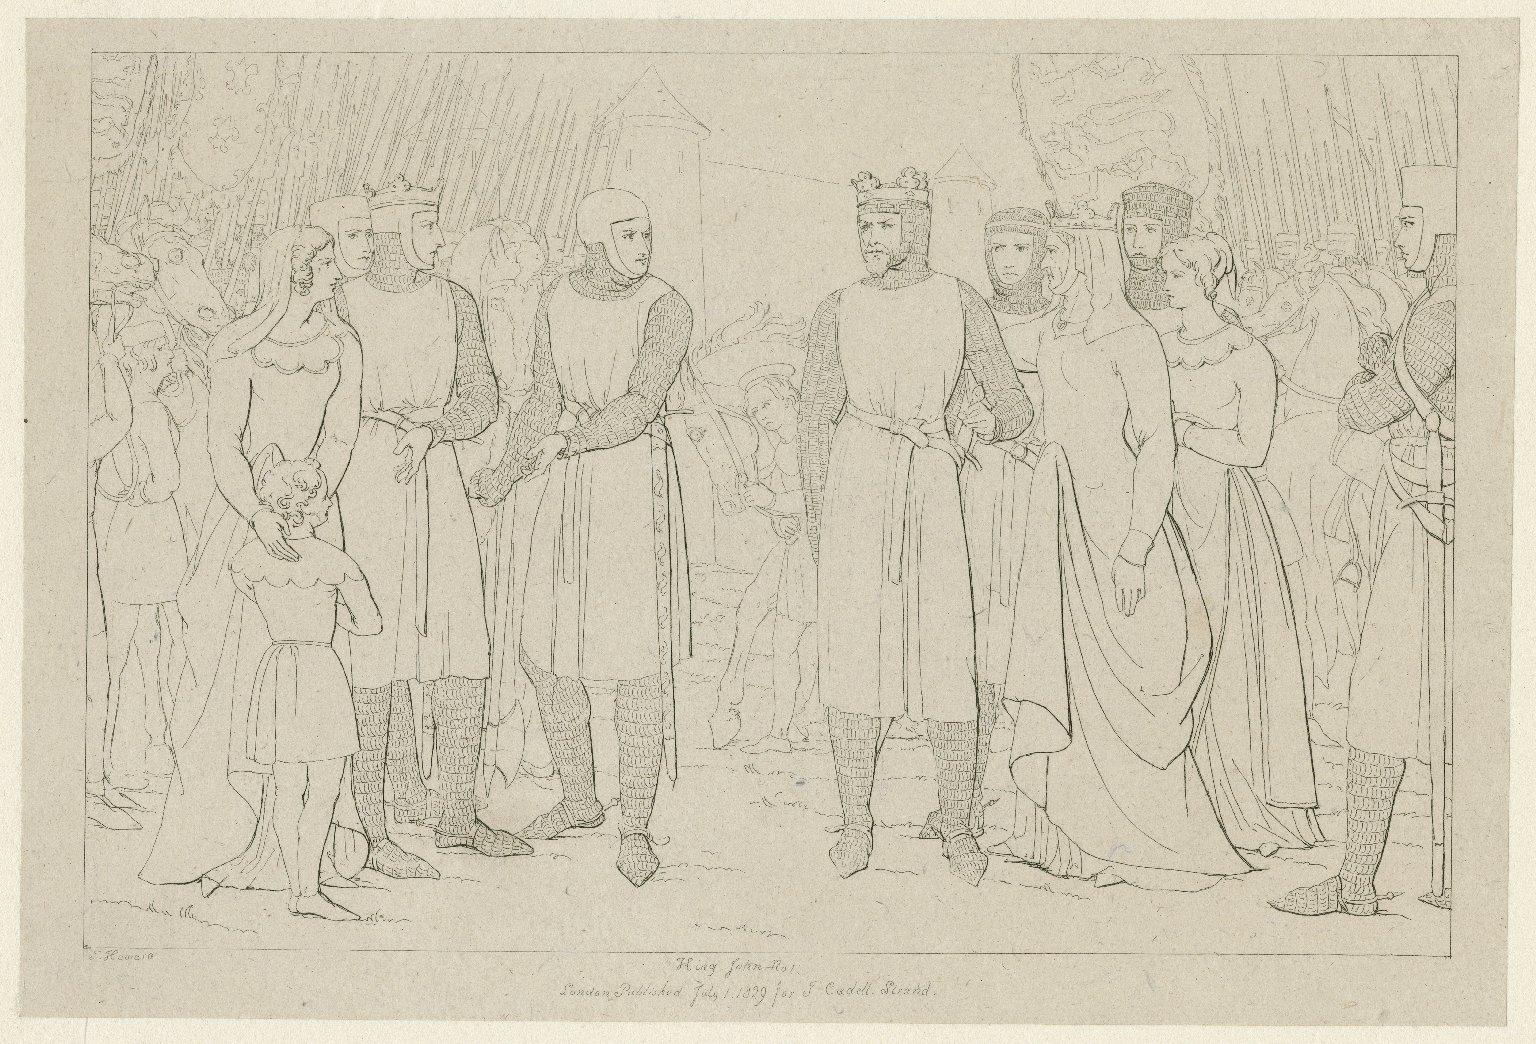 King John [graphic] / F. Howard.